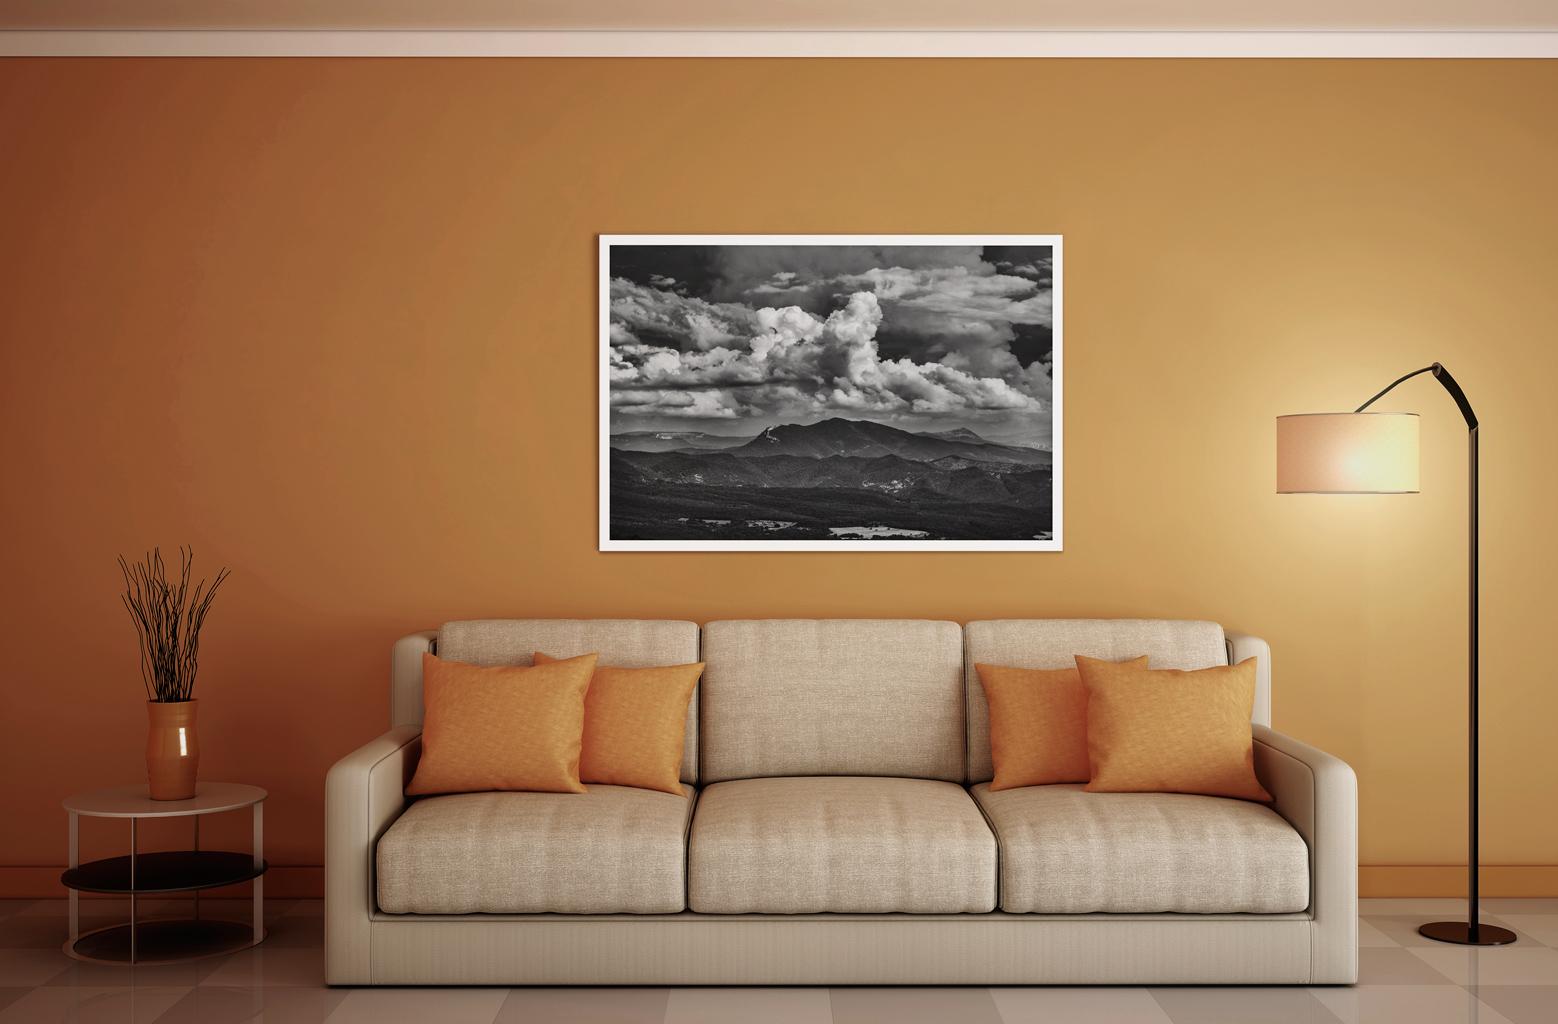 poster-frame-mockup-free